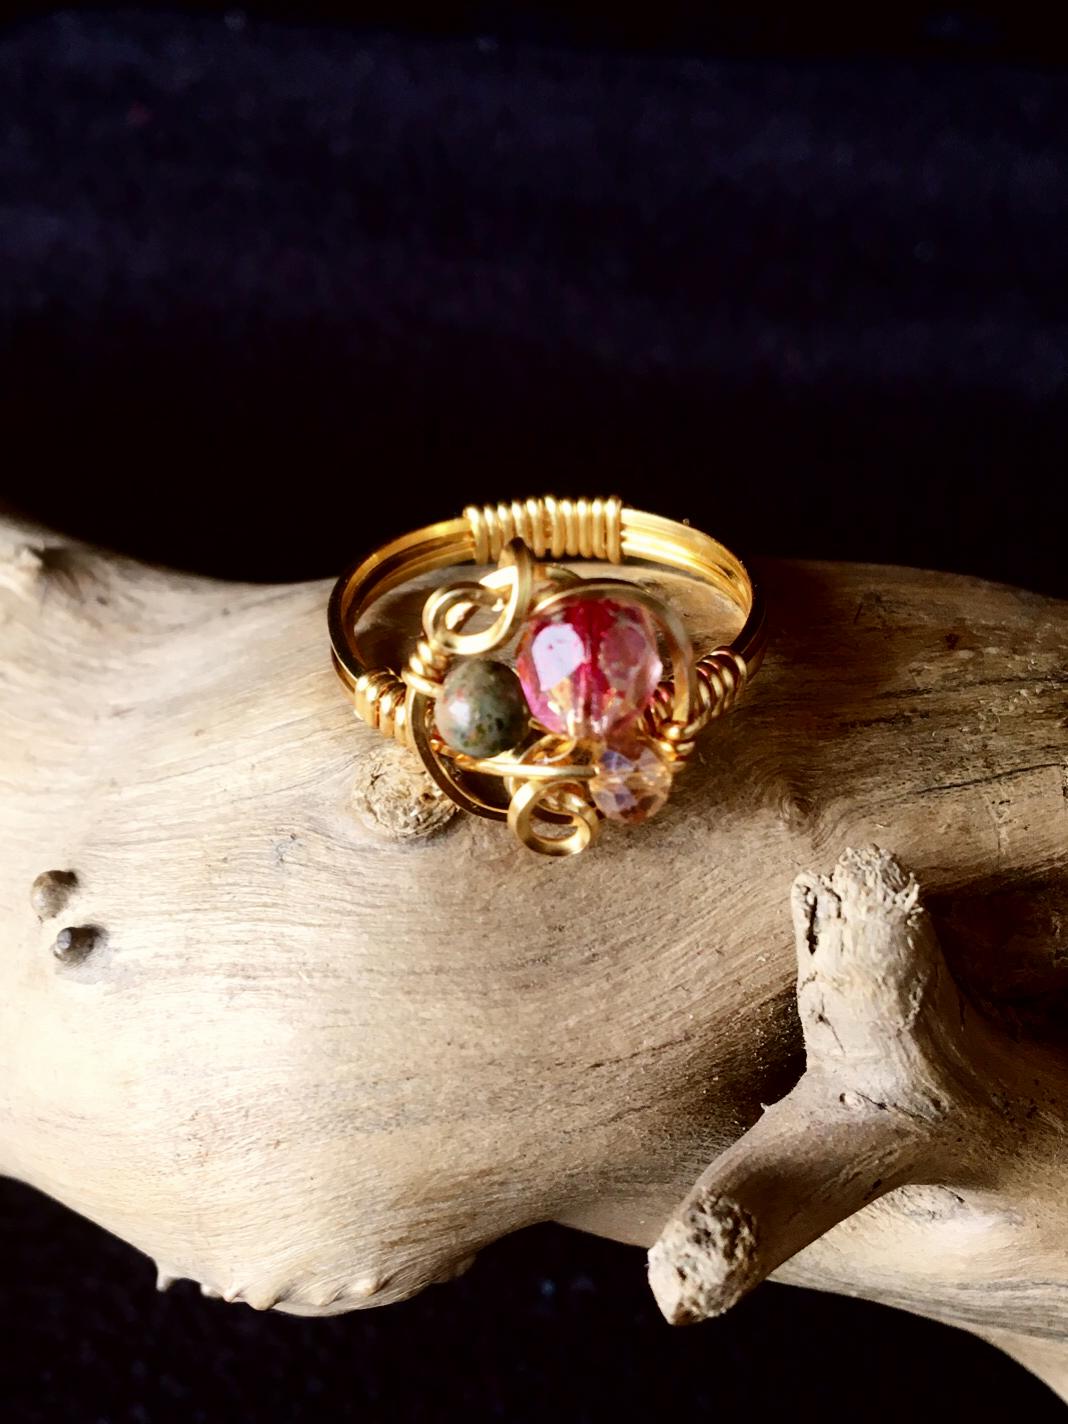 Dainty Deva Ring - Swarovsky and jasper - Silver Plated Gold Color